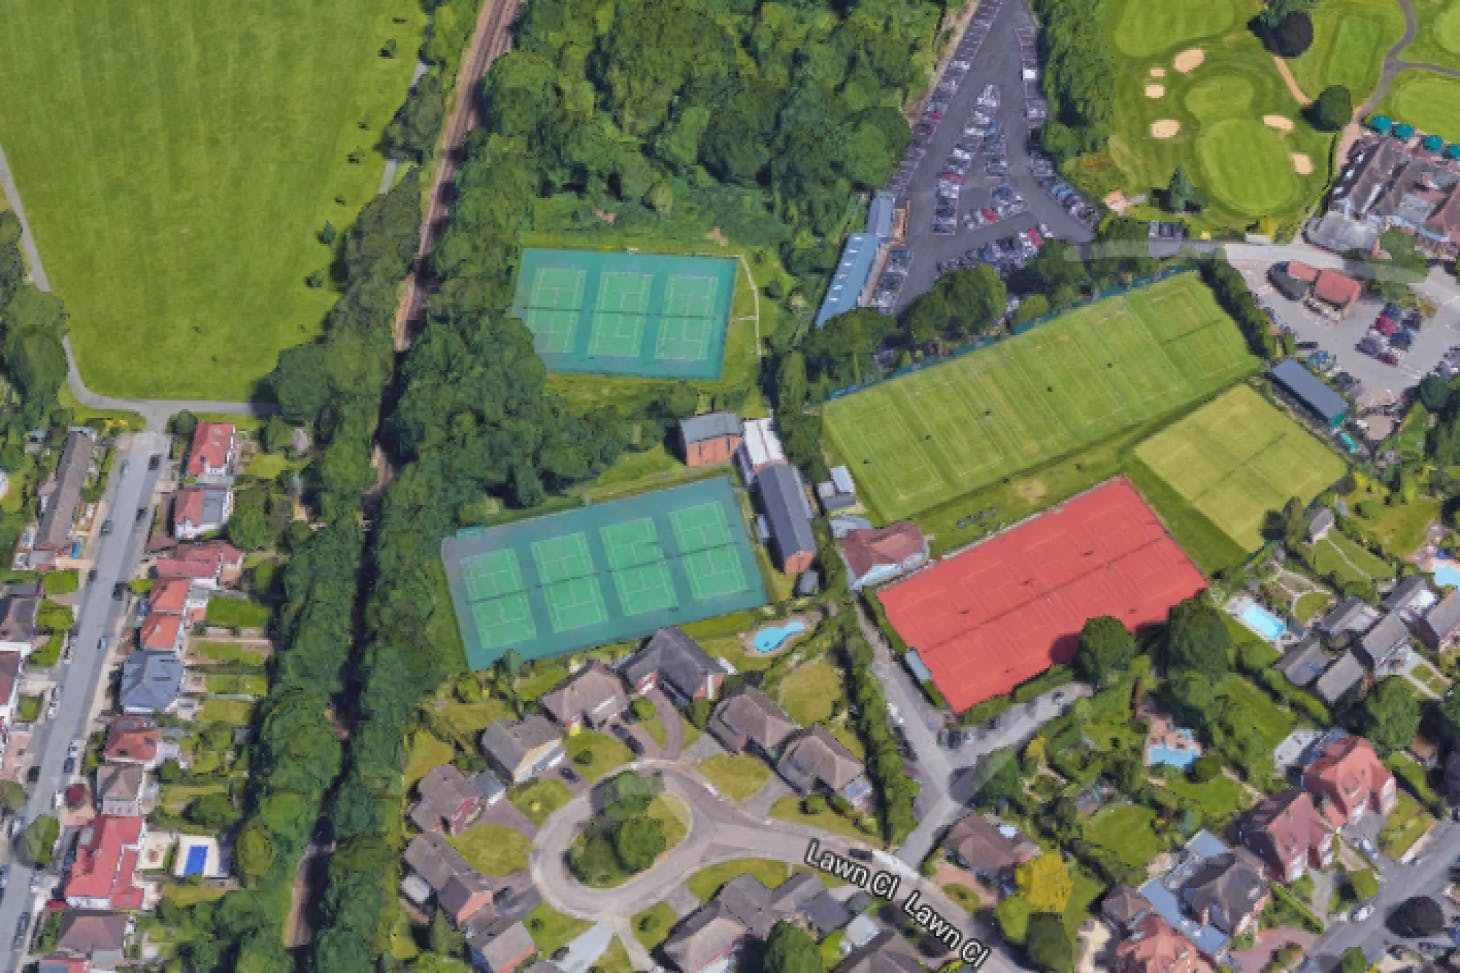 Sundridge Park Lawn Tennis & Squash Rackets Club Indoor | Hard squash court